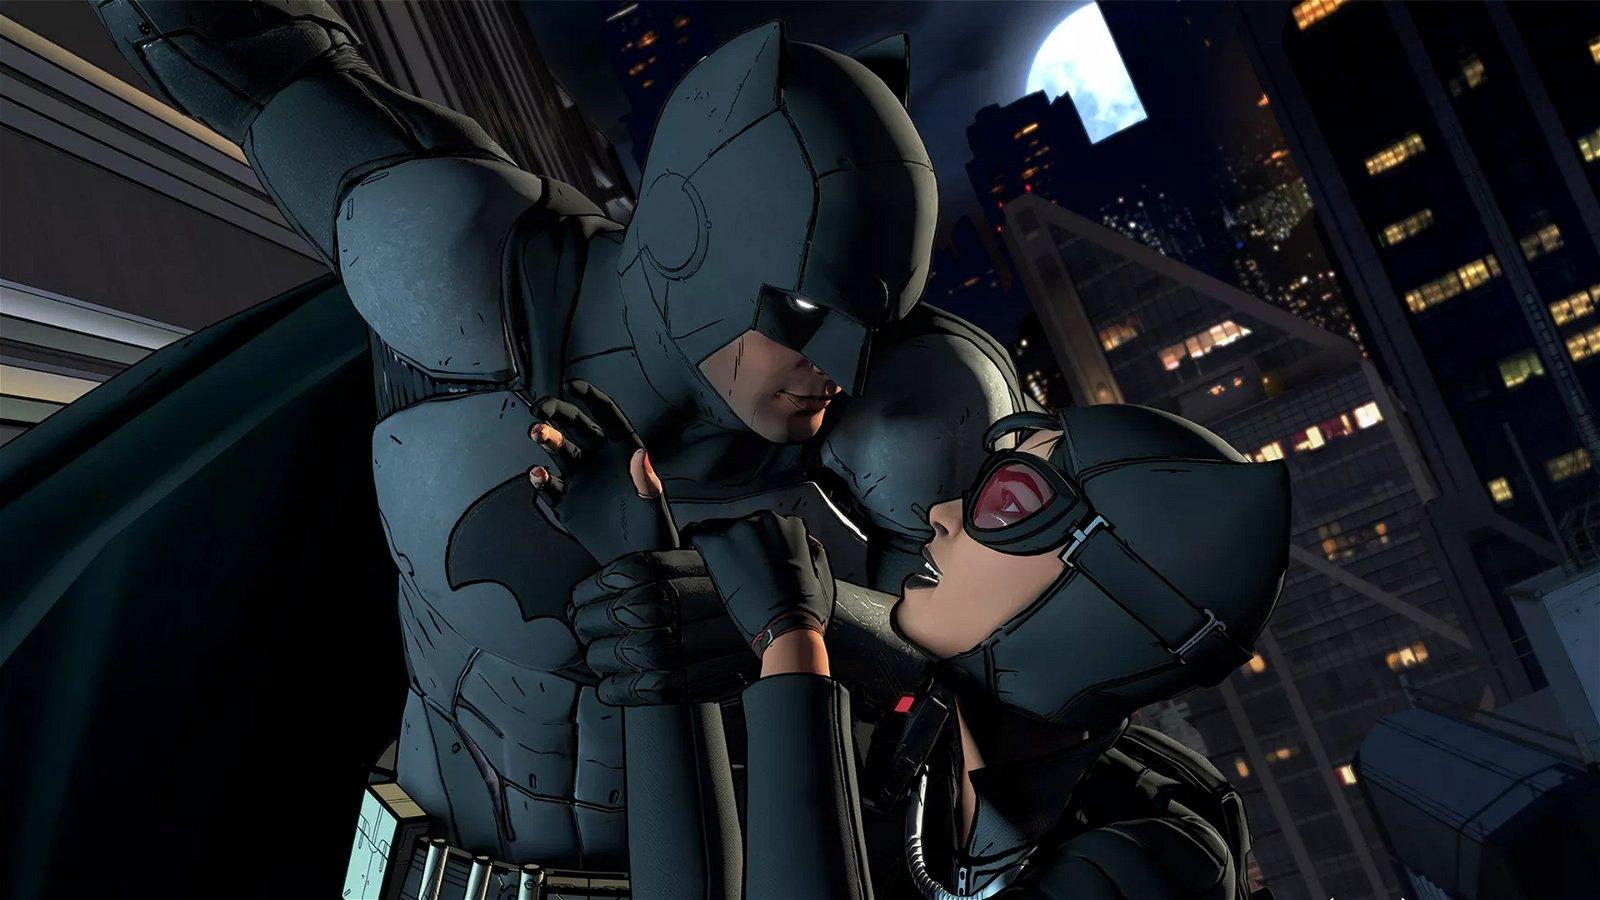 Bruce Wayne fans will dig Telltale's Batman 1